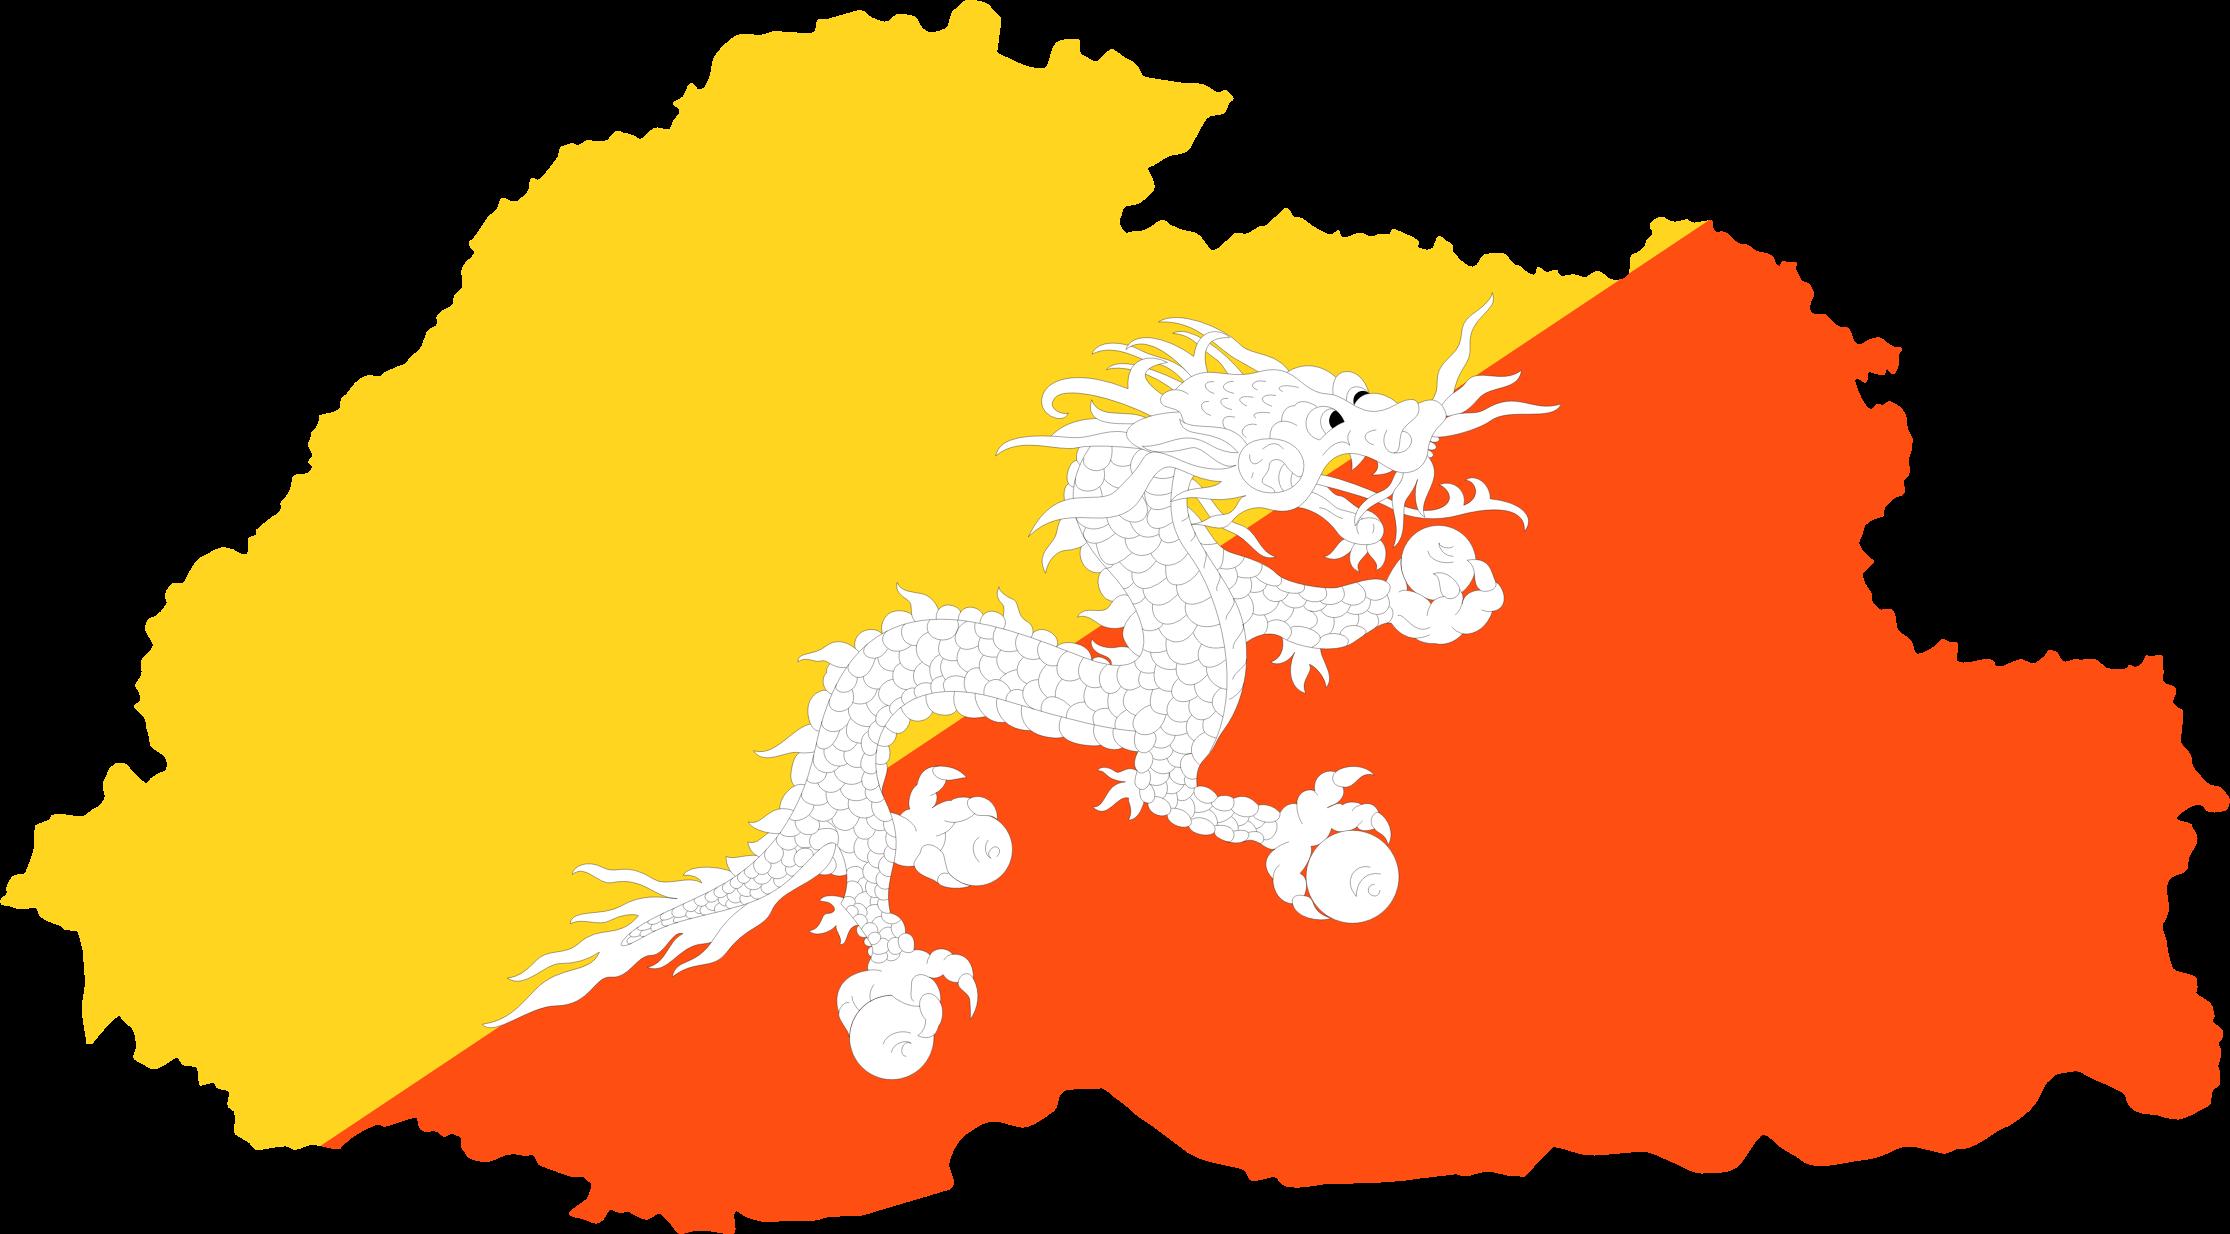 clipart  bhutan map flag - bhutan map flag